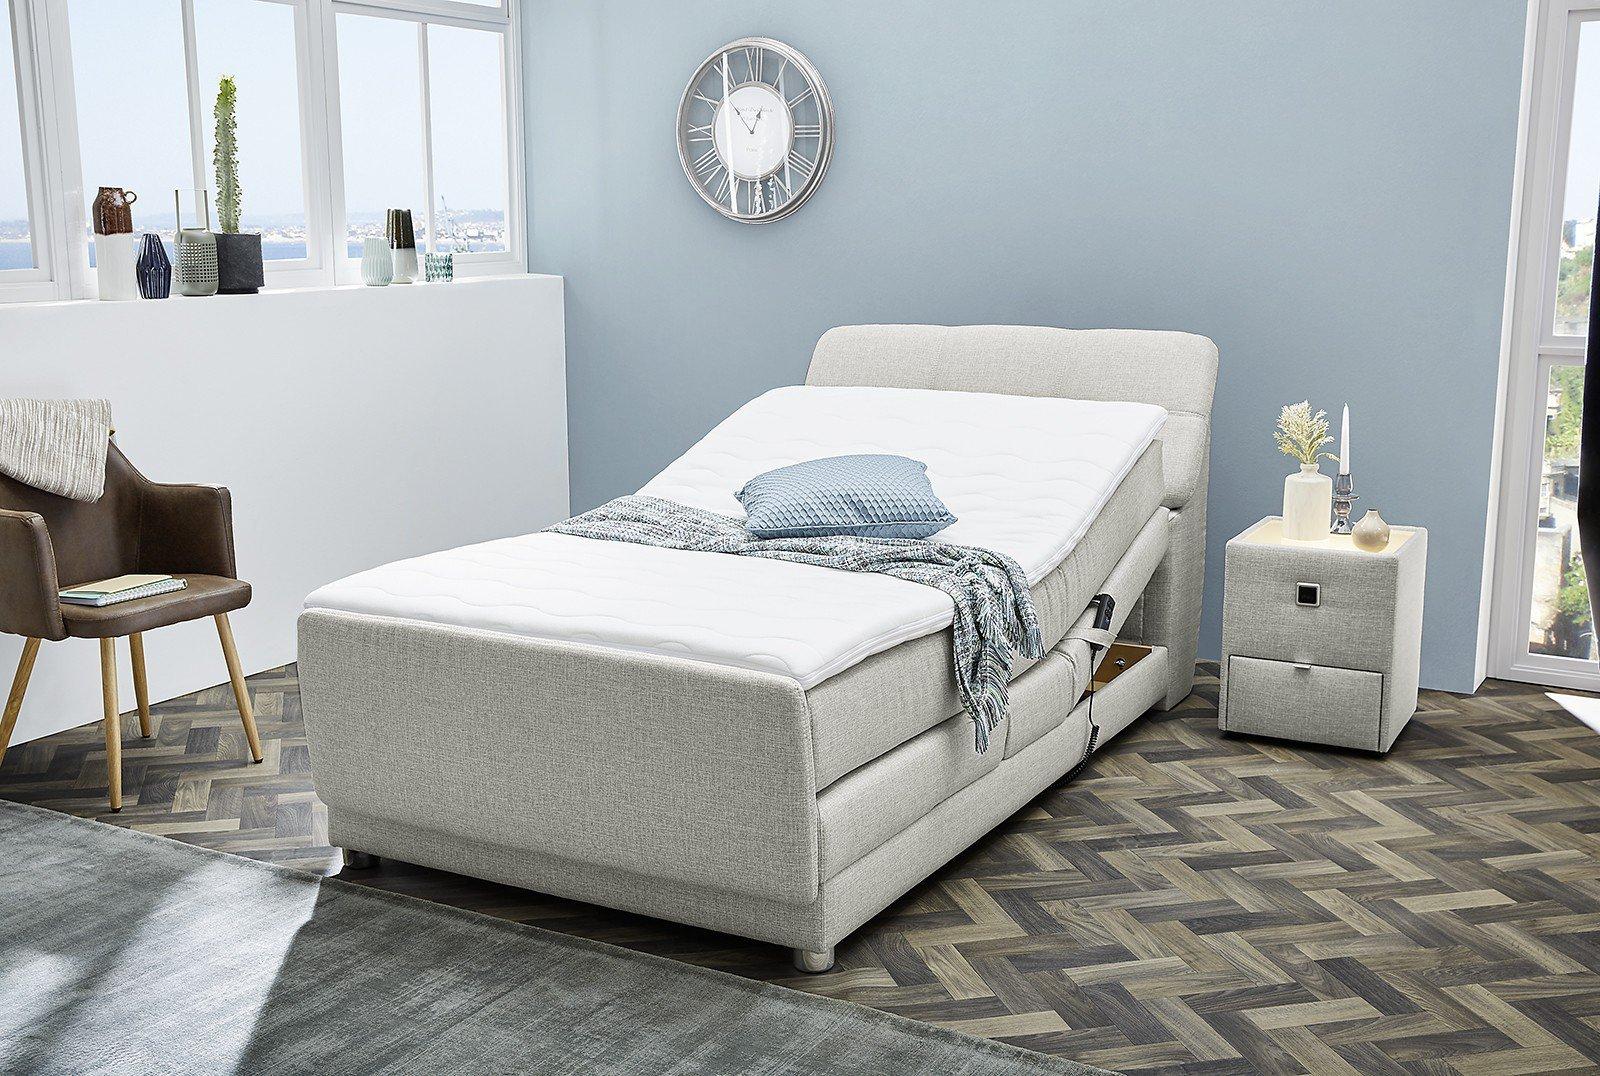 jockenh fer boxspringbett mona in grau 120 x 200 cm m bel letz ihr online shop. Black Bedroom Furniture Sets. Home Design Ideas